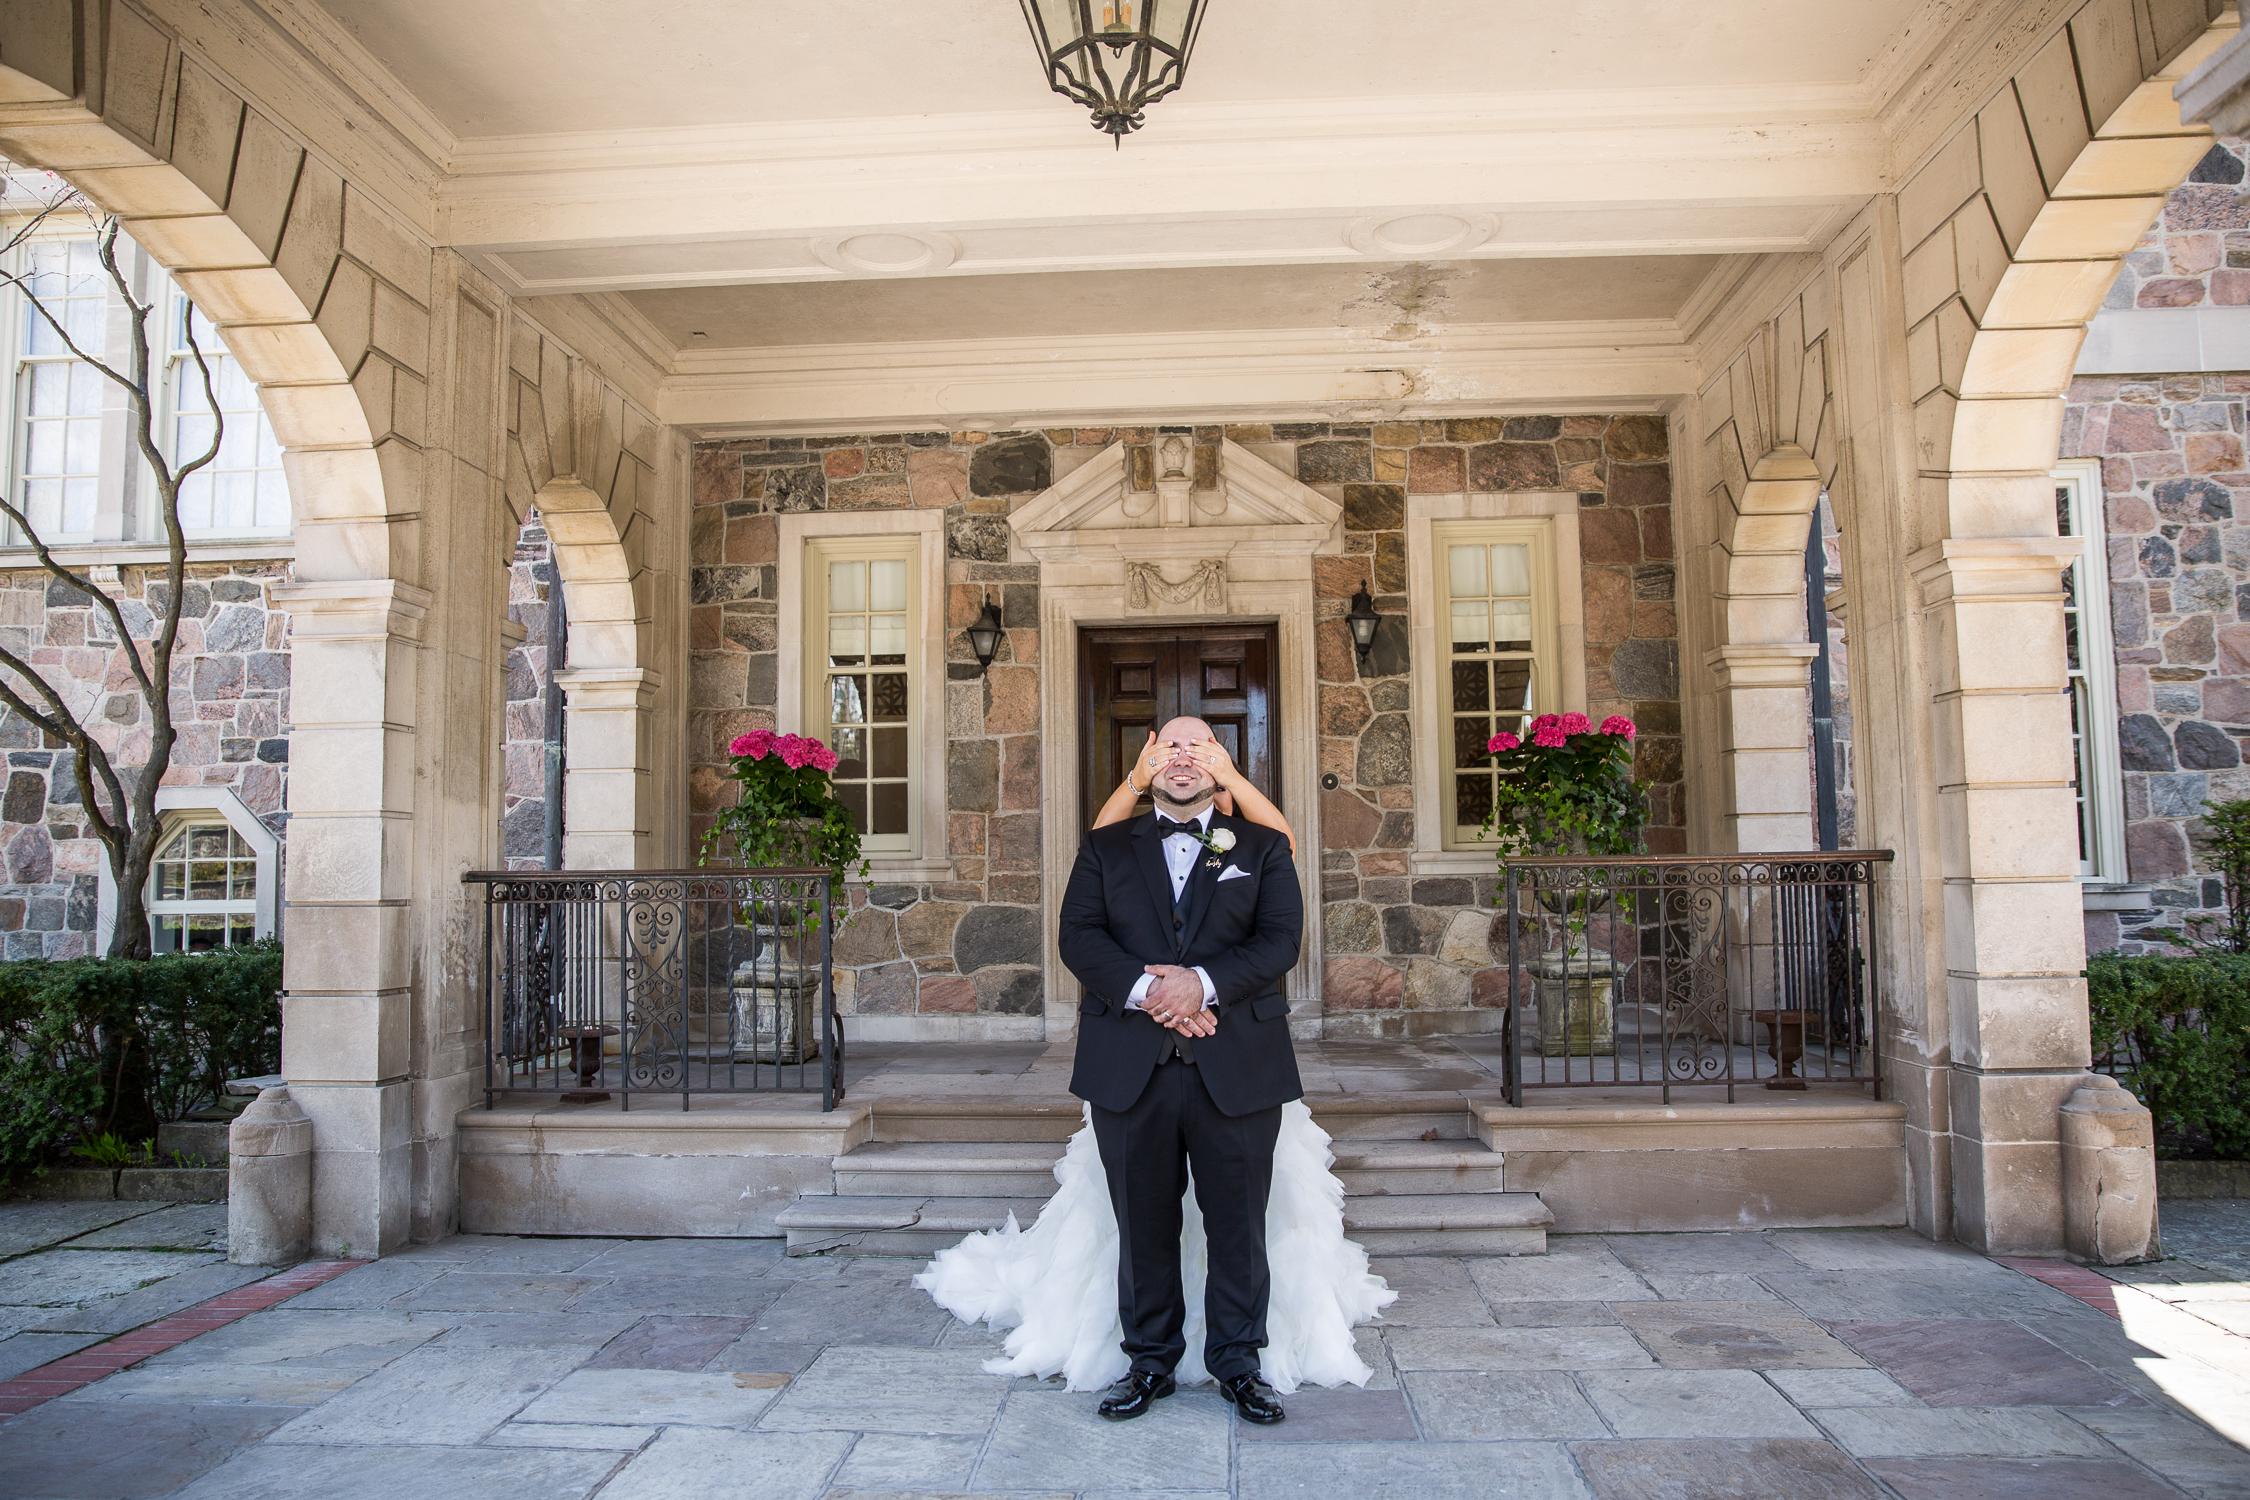 Peter-and-Marie-Wedding-Fontana-Primavera-Graydon-Hall-Manor-Toronto-Ontario-Canada-0013.jpg